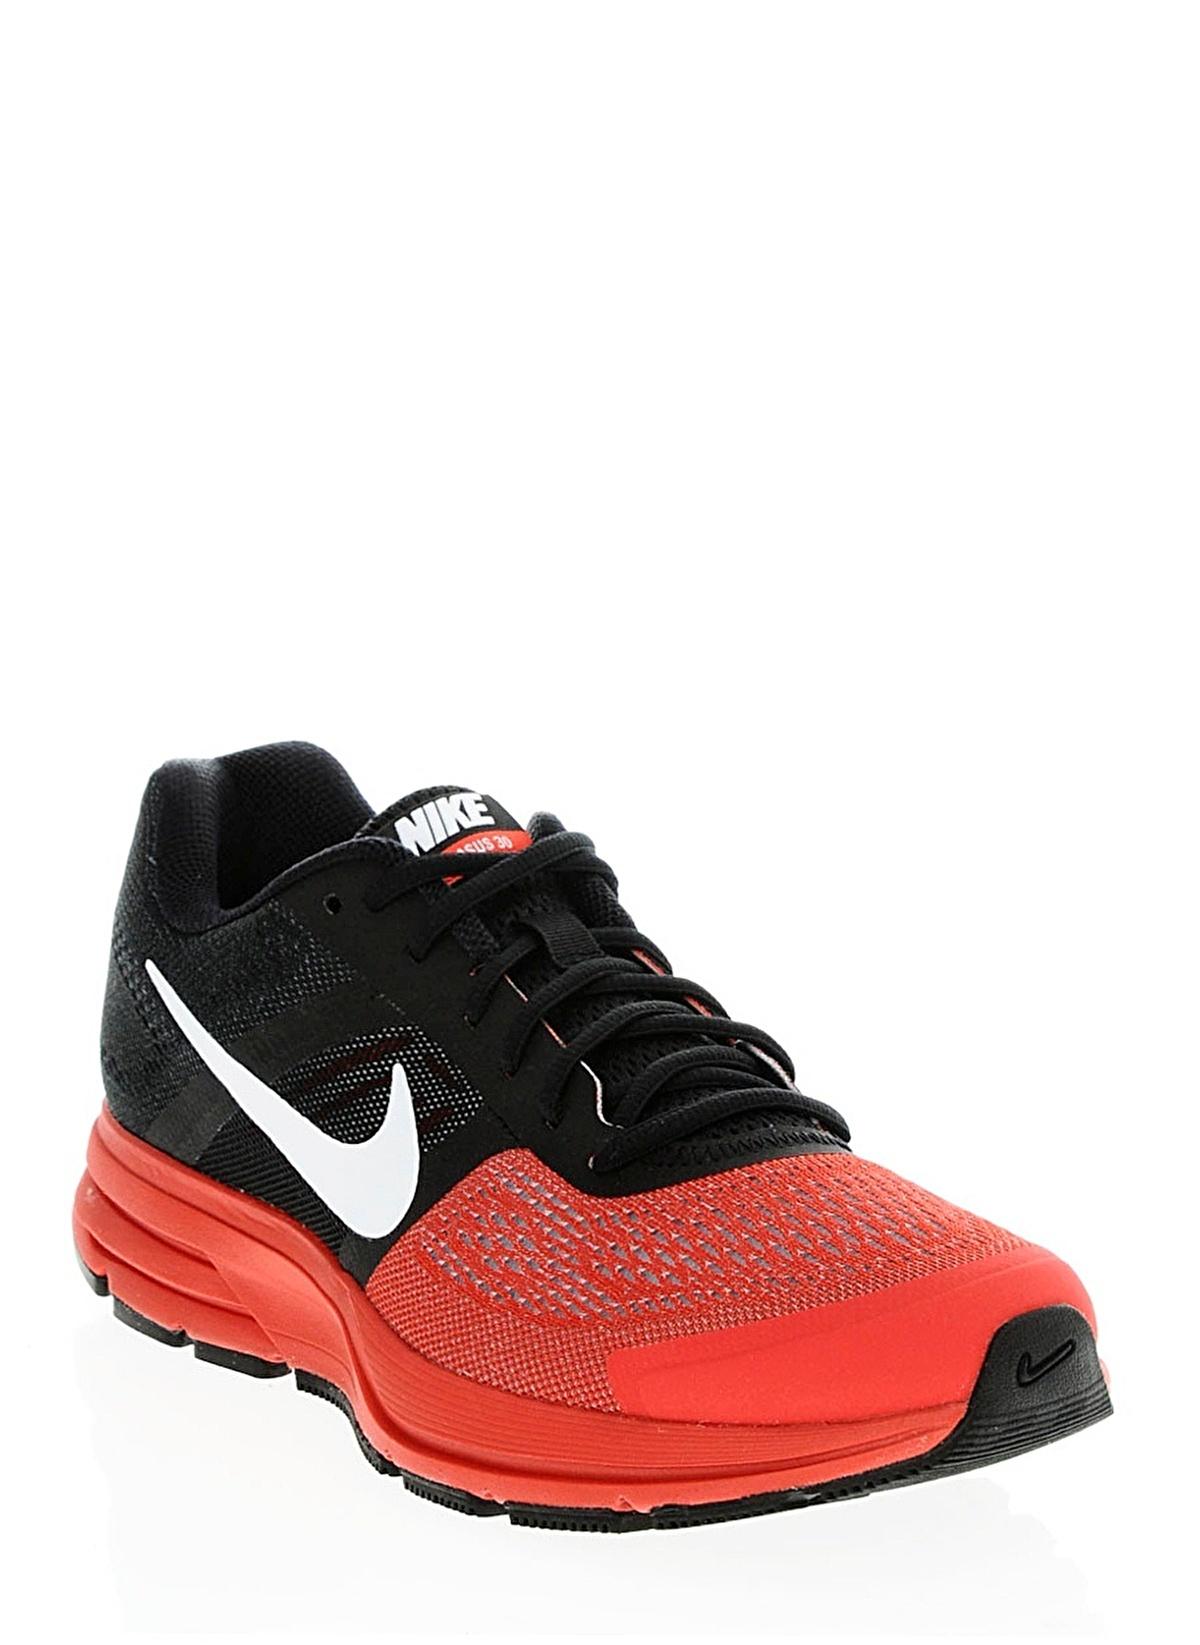 Juntar salario Puede ser calculado  nike pegasus 30 Cheap Nike Air Max Shoes